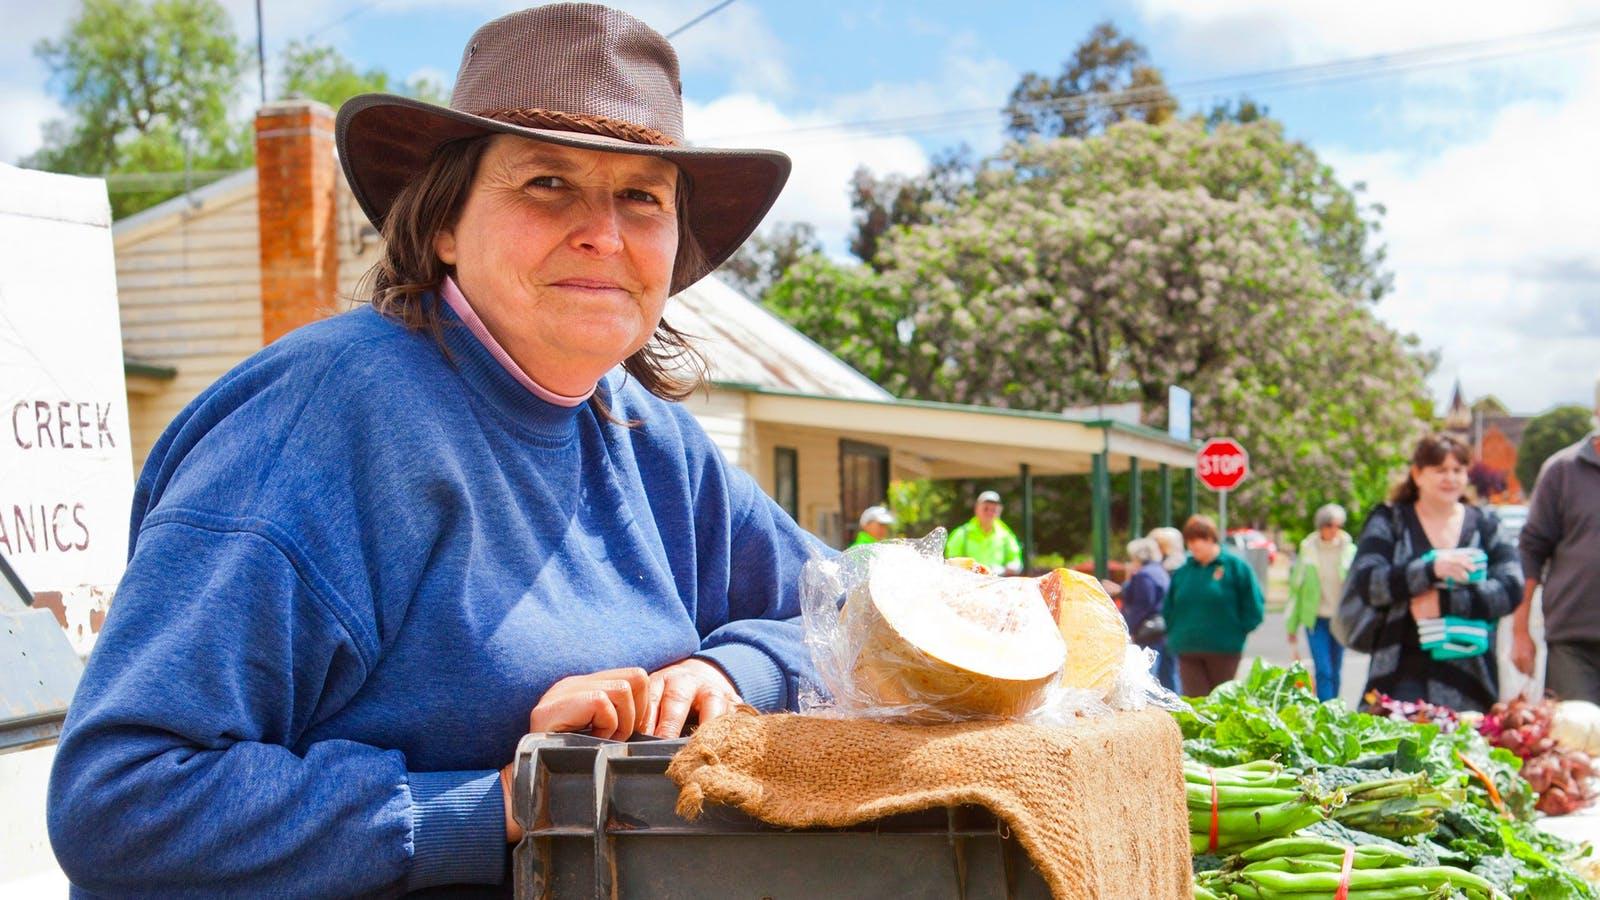 Lisa of Spring Creek Organics